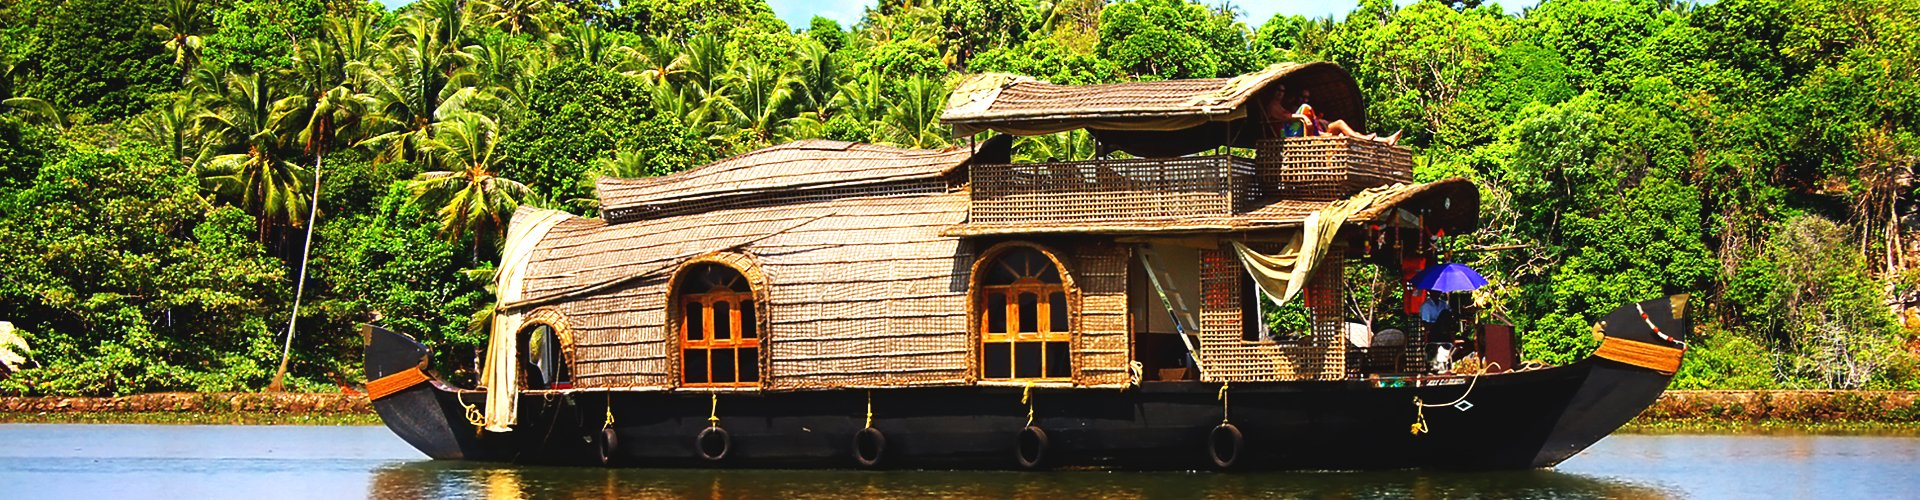 Backwaters in Kerala, Zuid-India